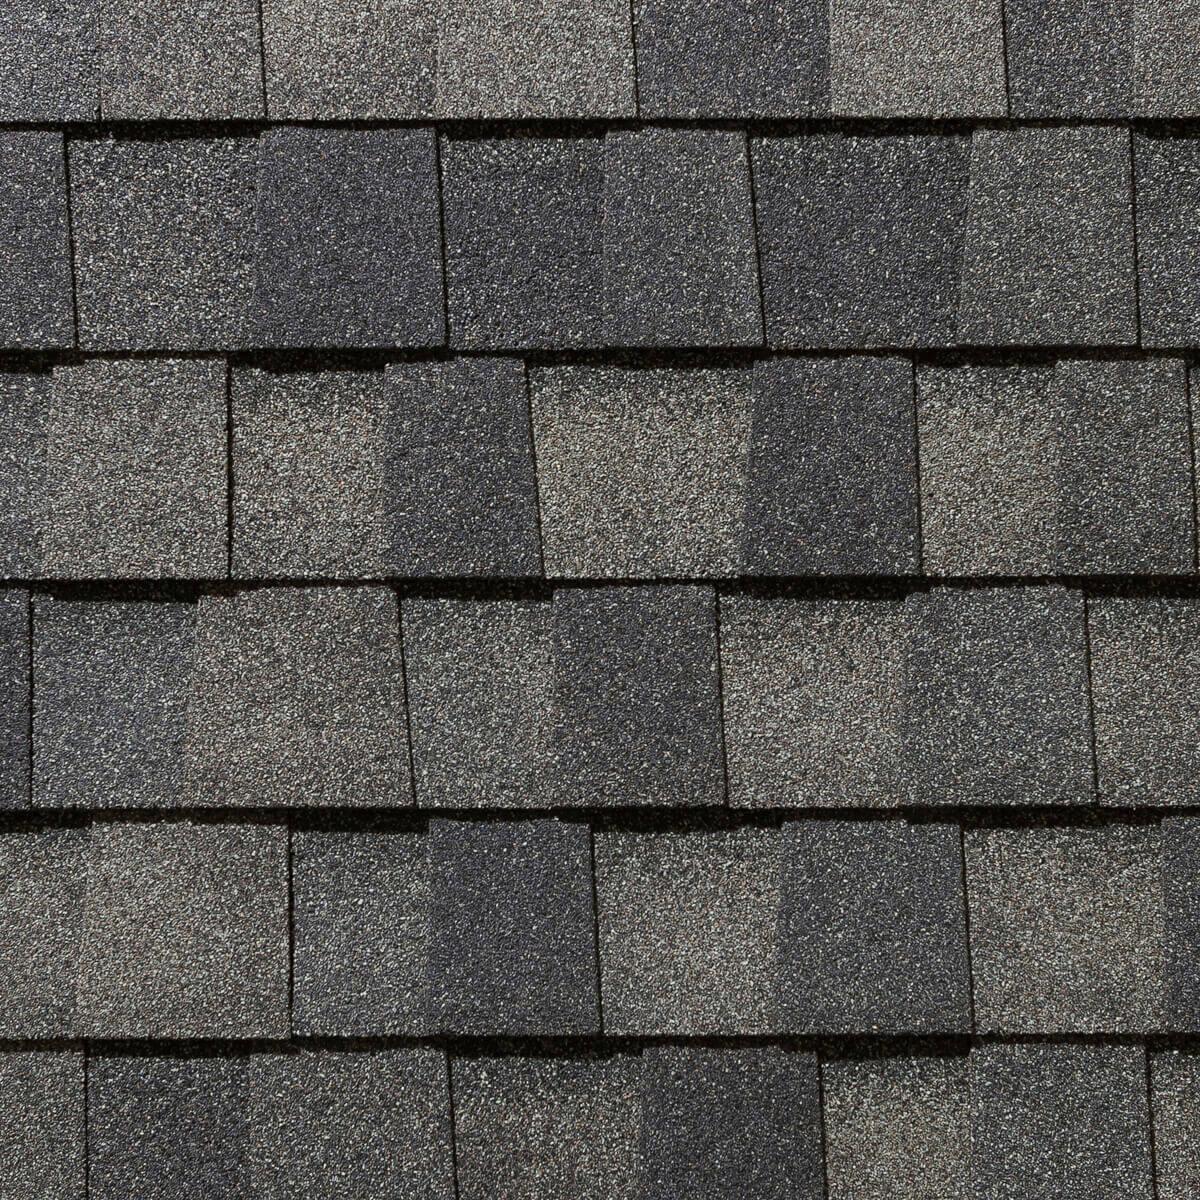 Mystique Laminated Roofing Shingles - Twilight Grey